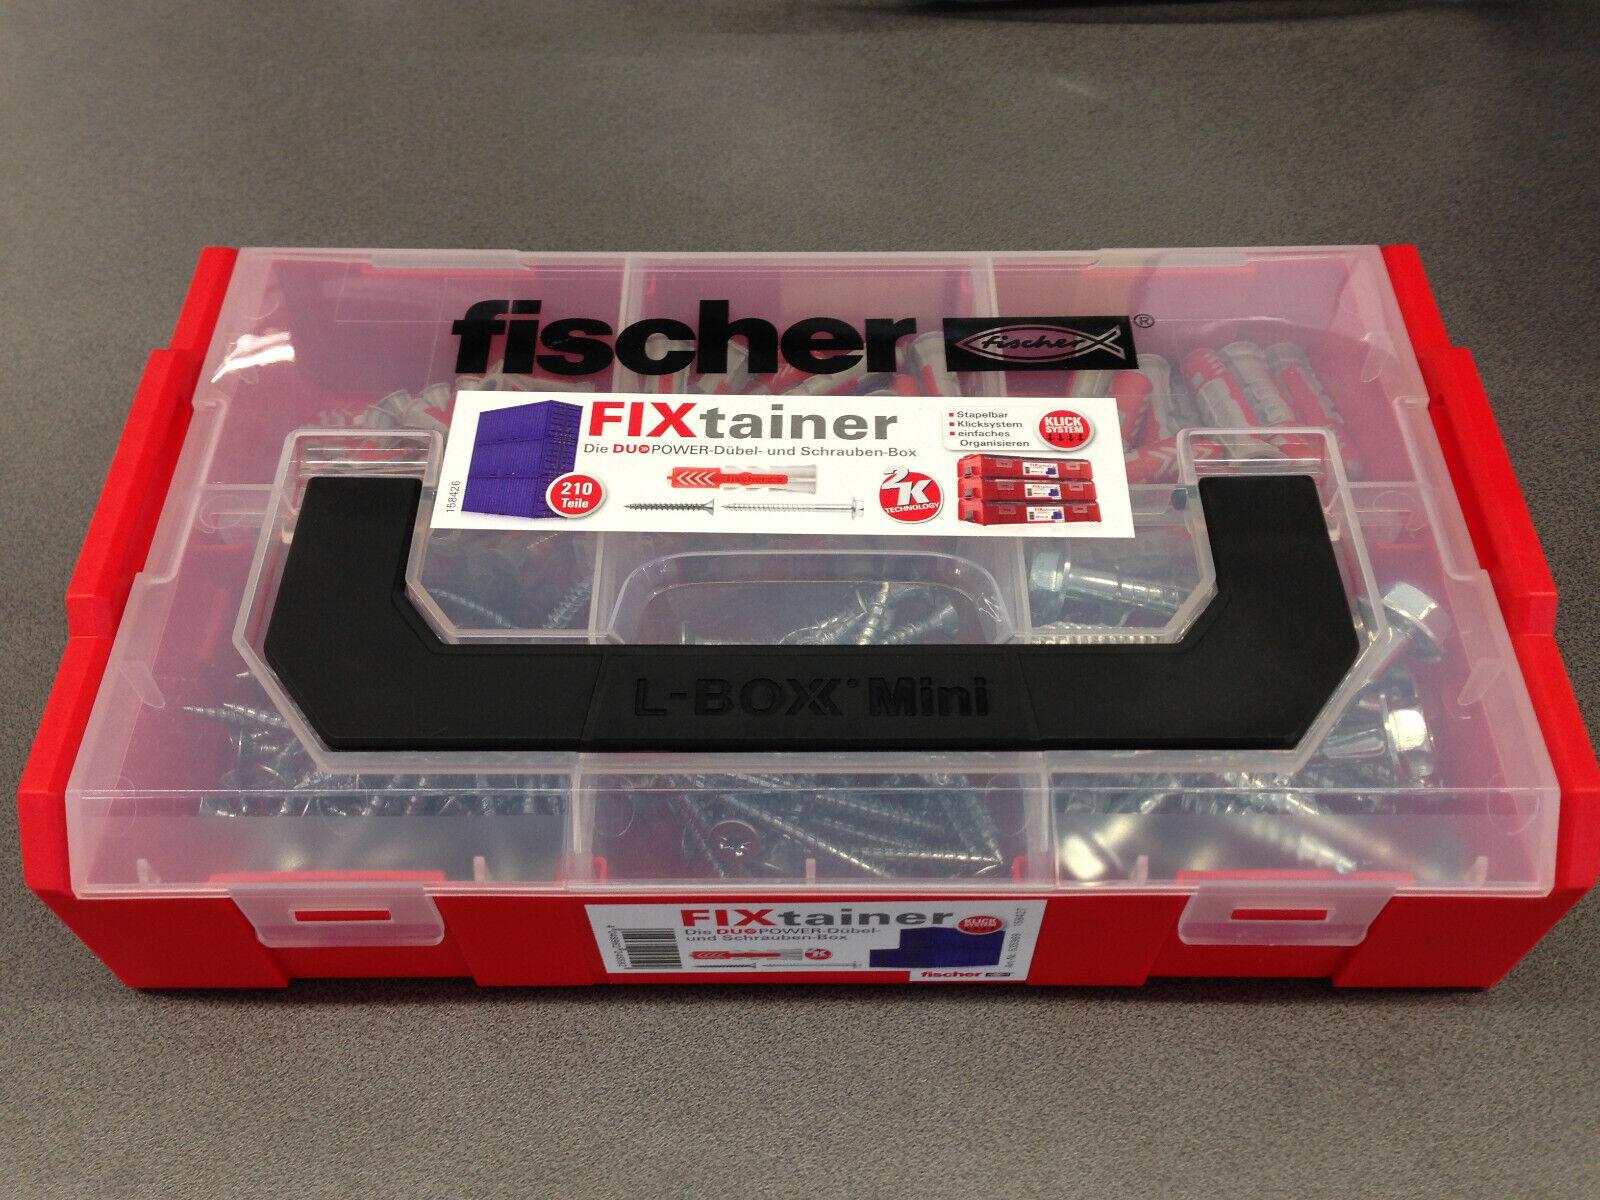 Fischer DUOPOWER Fixtainer 535968 Dübel Box 210-tlg.